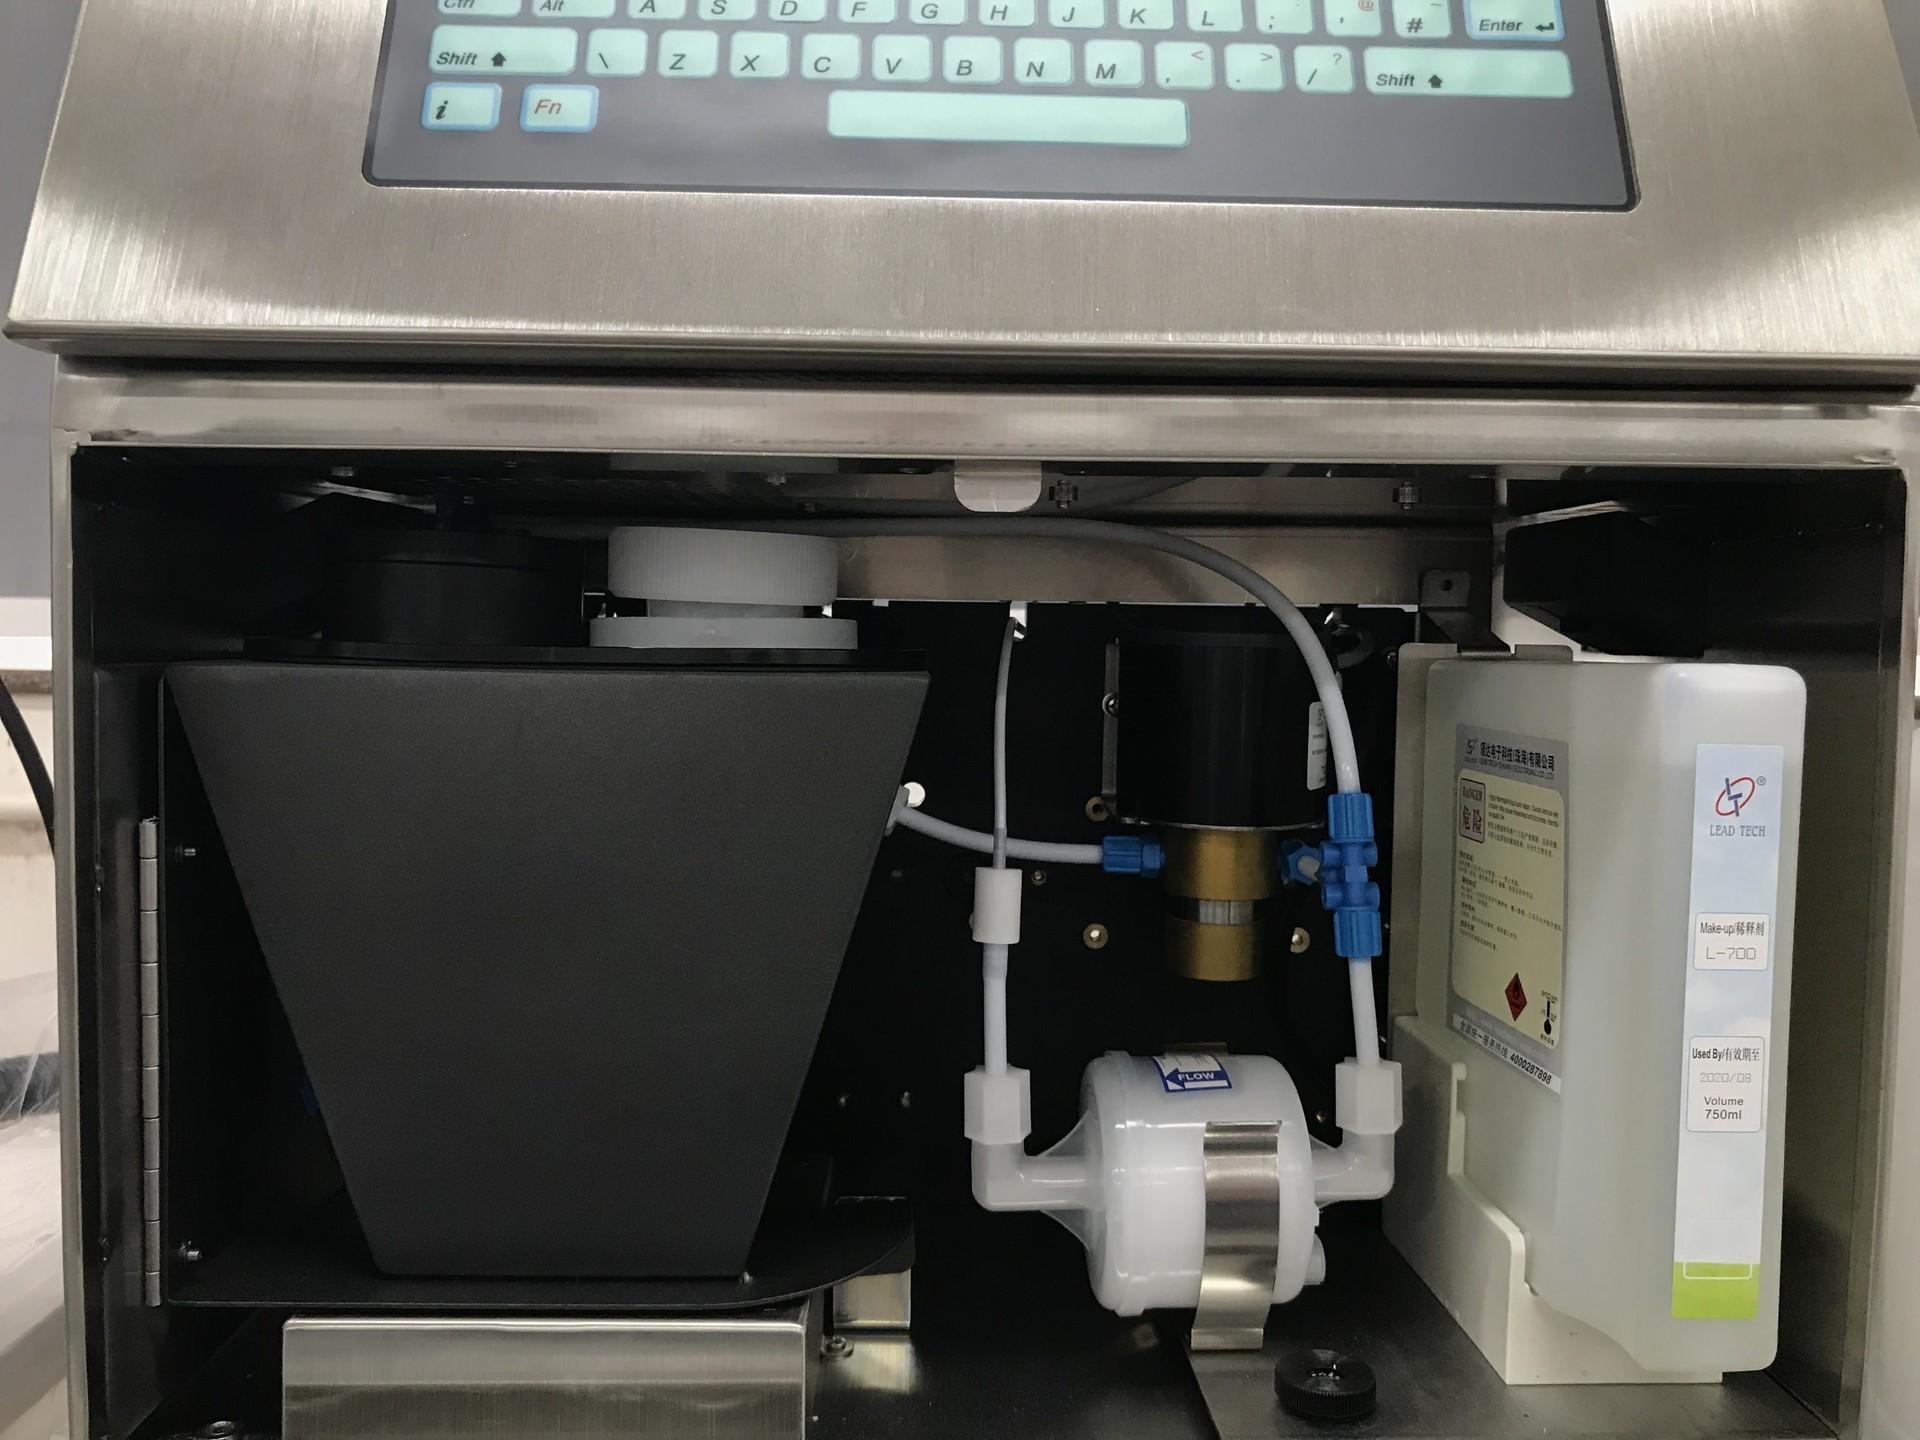 Lead Tech Lt1000s+ HDPE Coding Cij Inkjet Printer